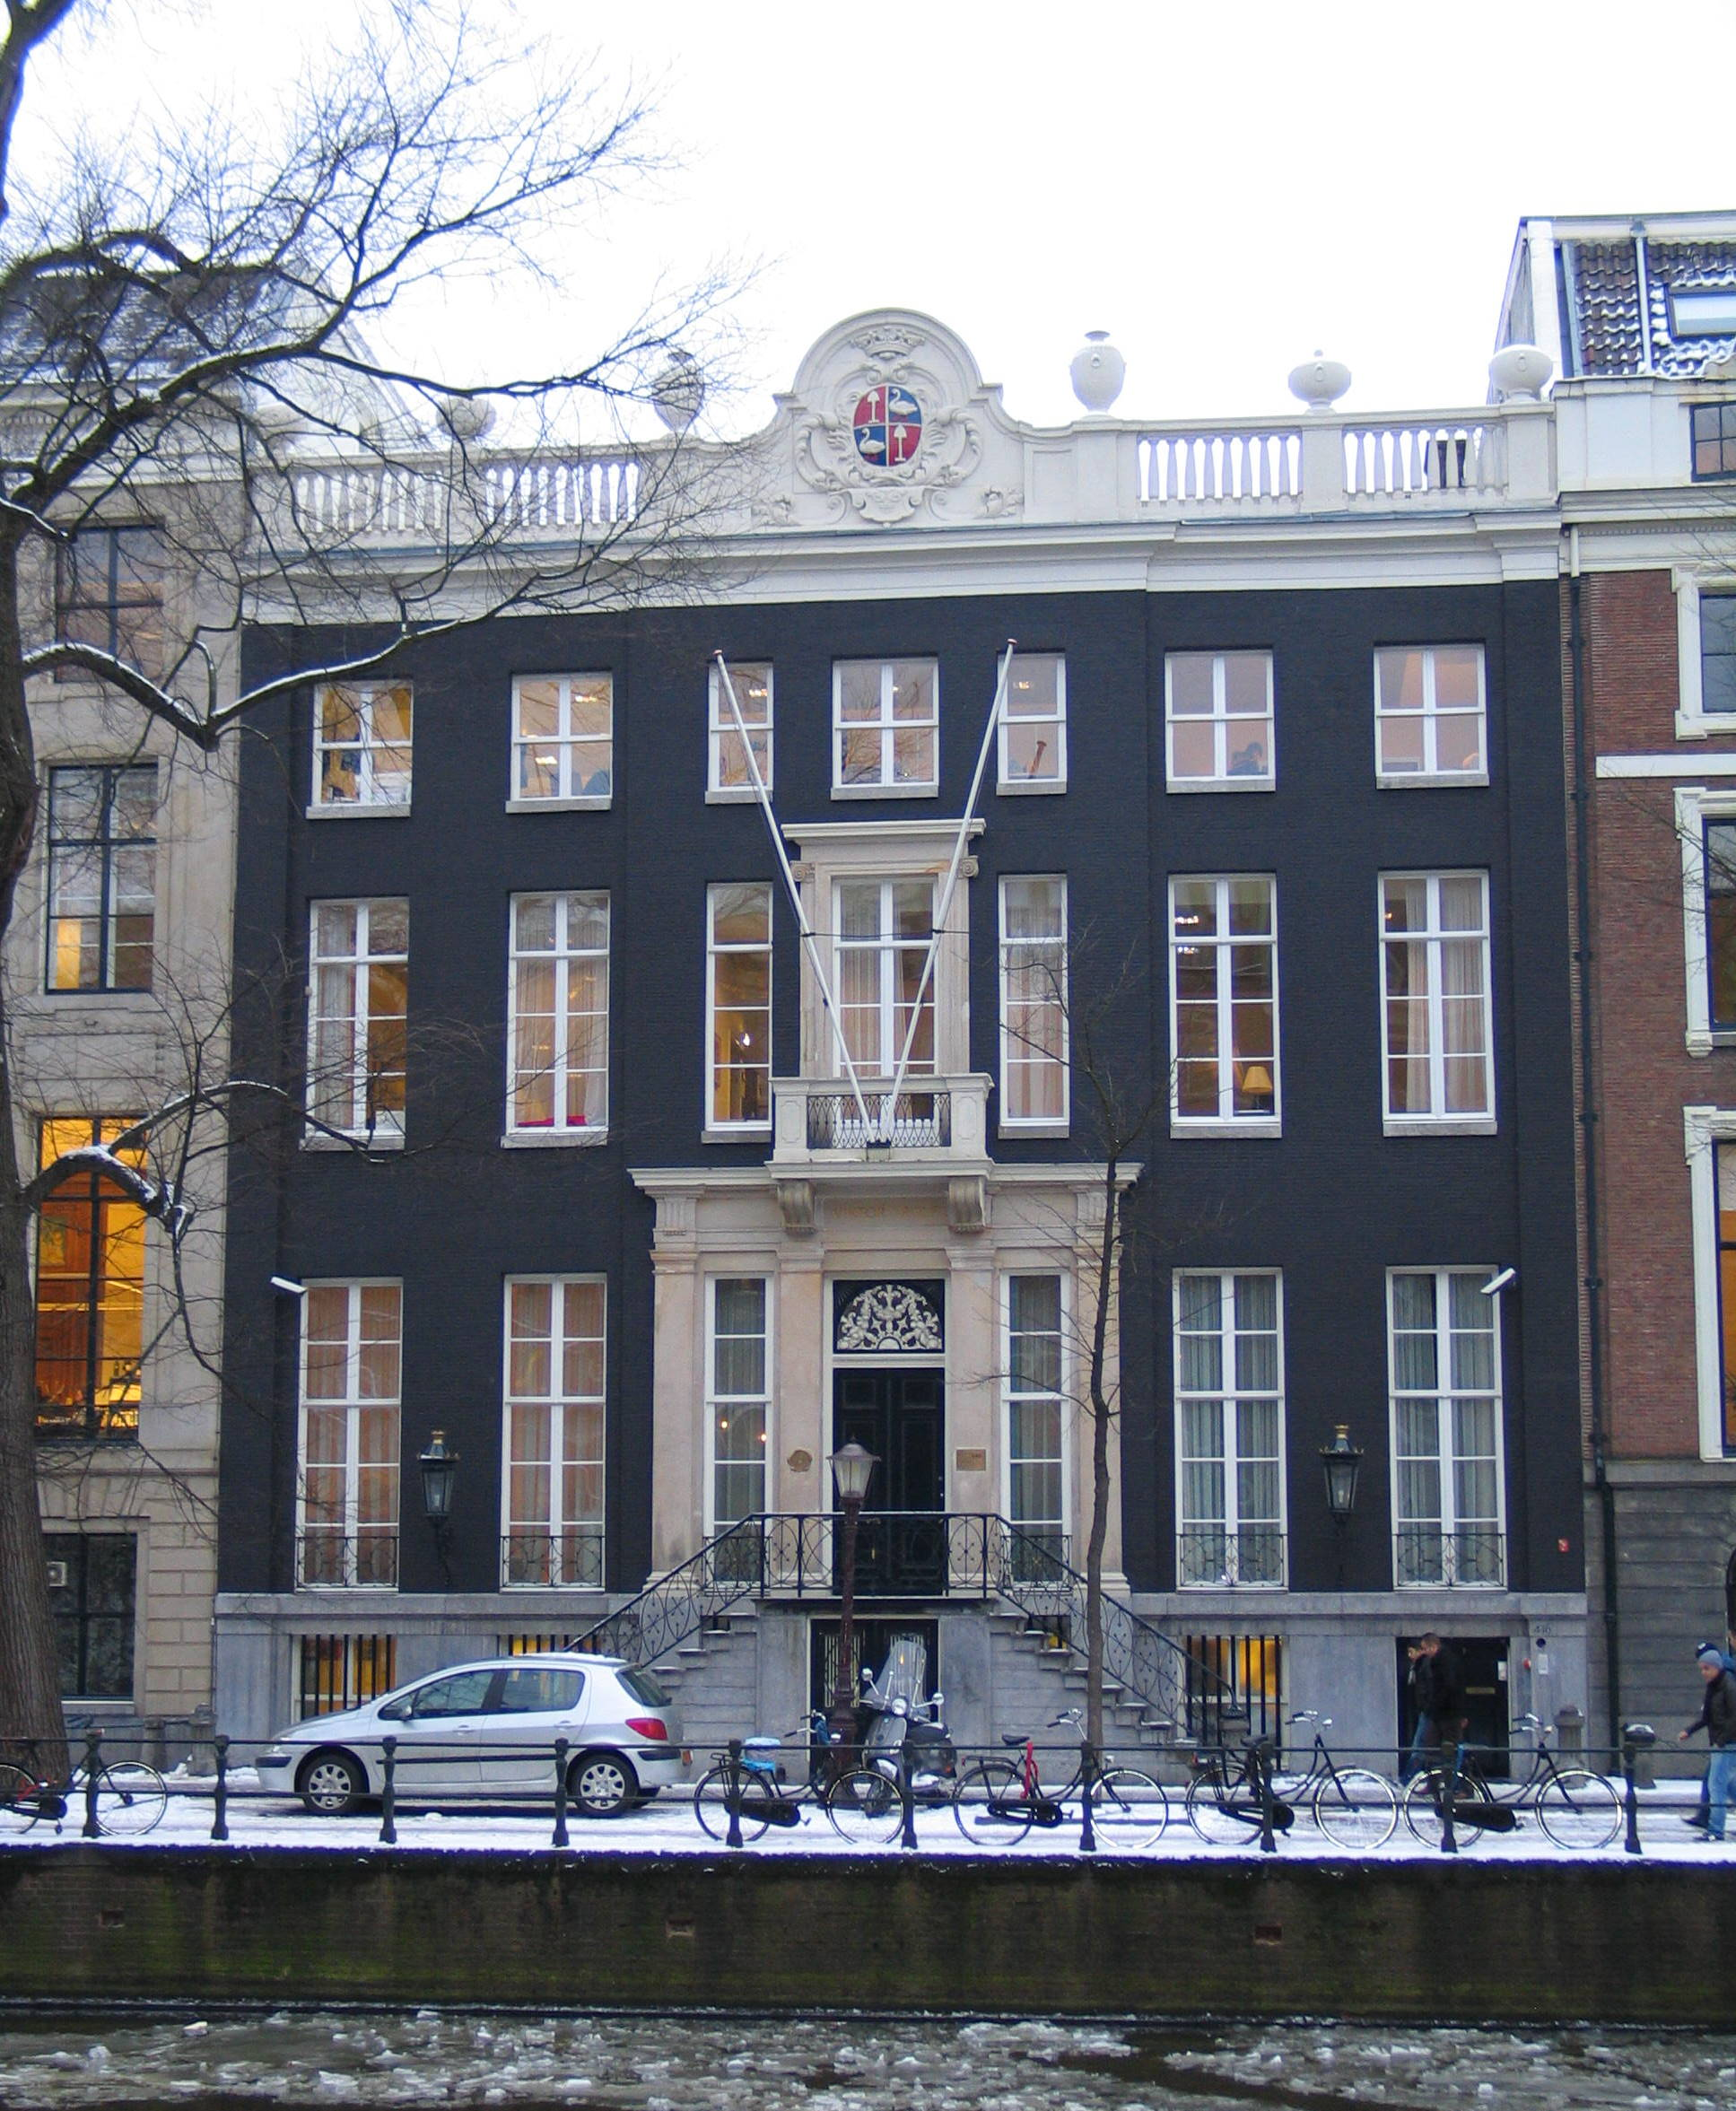 Huis van der graeff wikiwand for Herengracht amsterdam